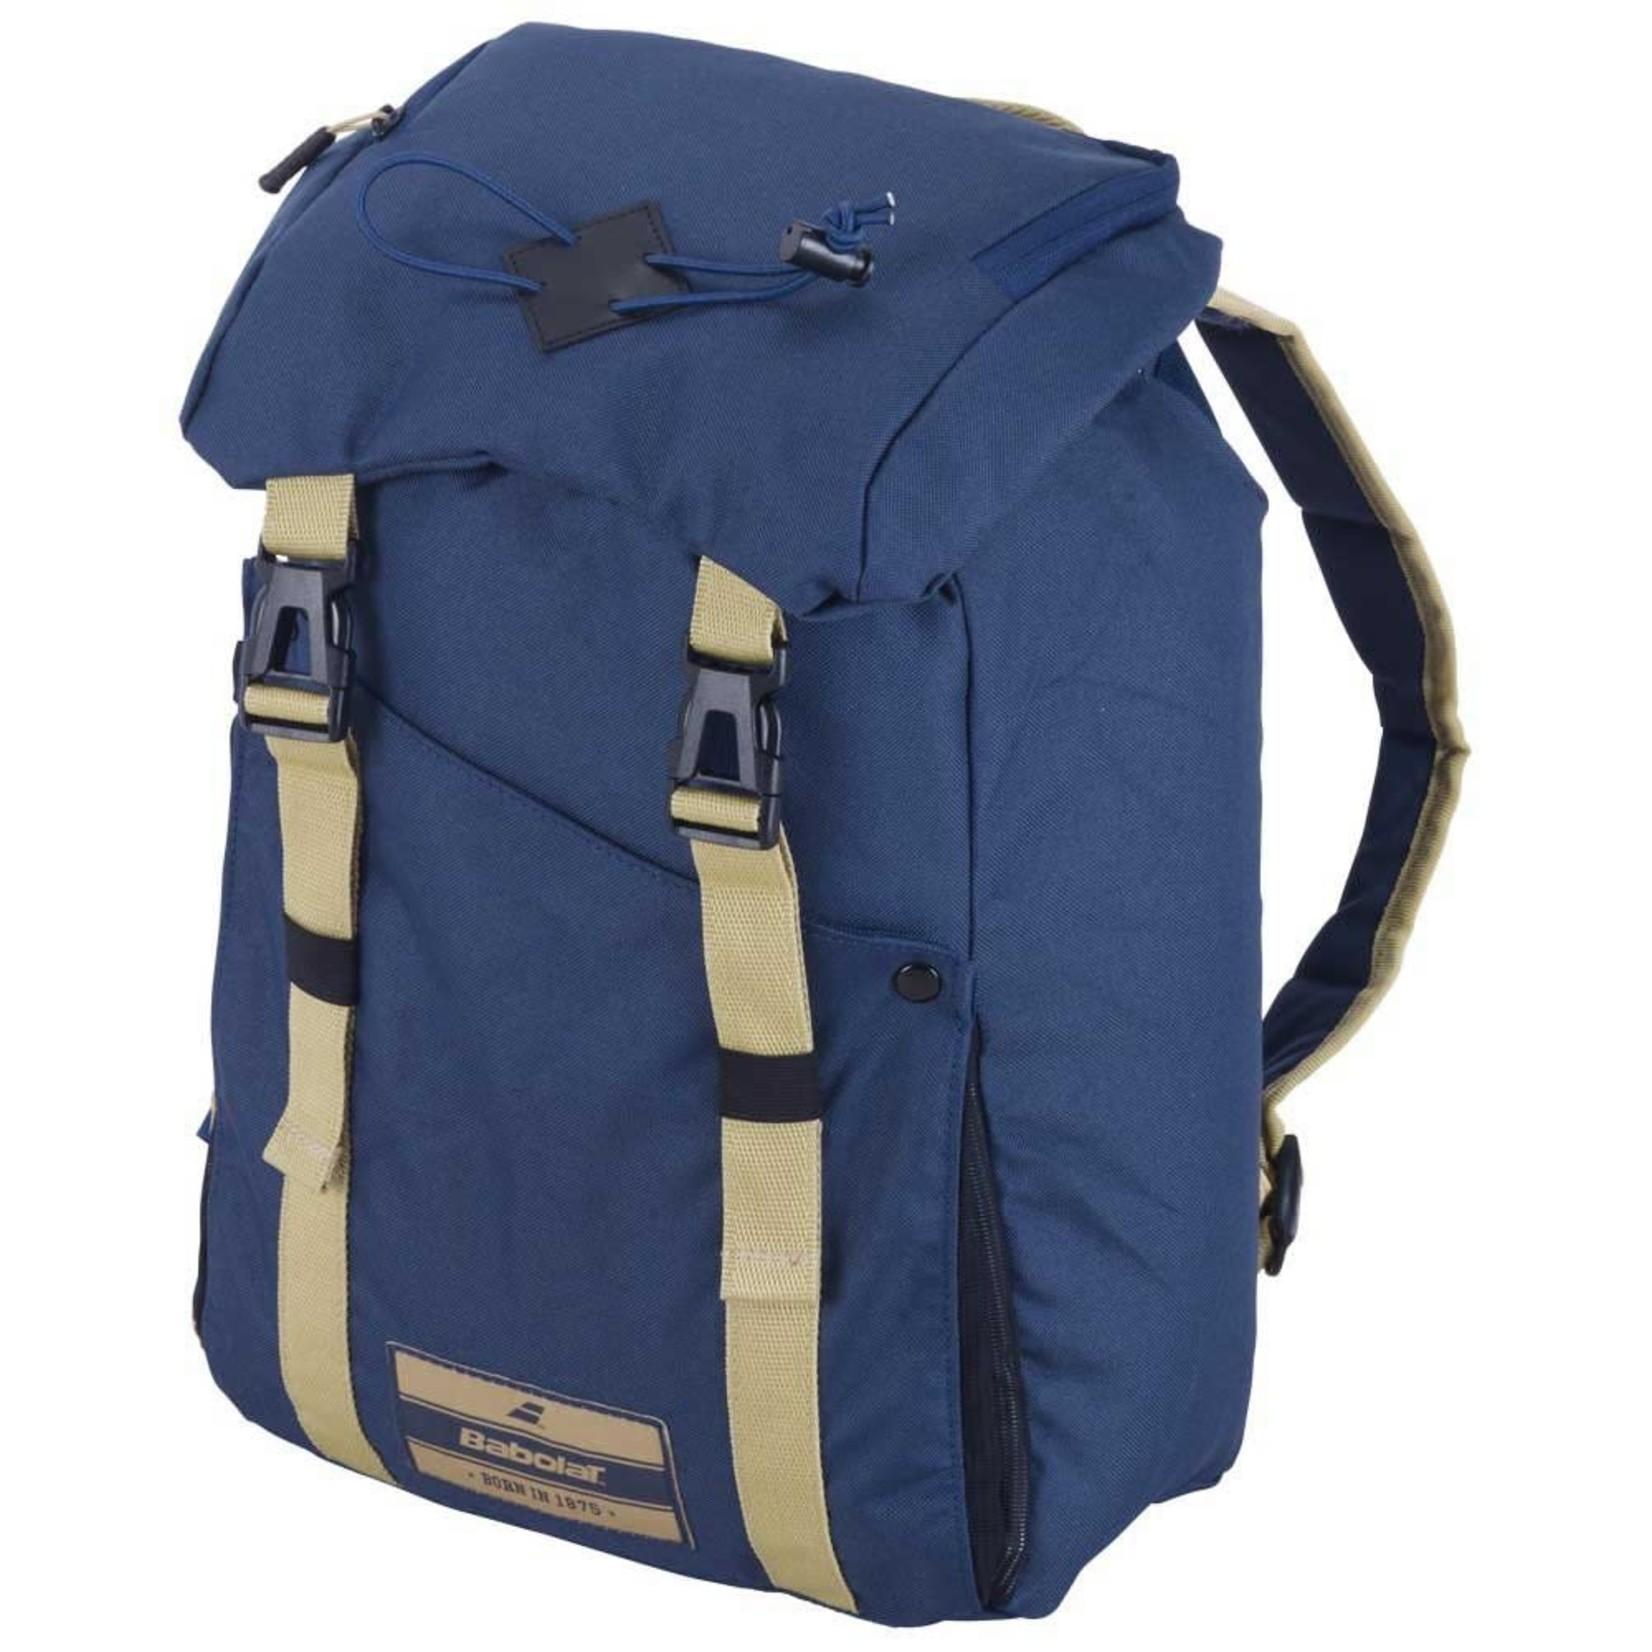 Babolat Classic Pack Rugzak